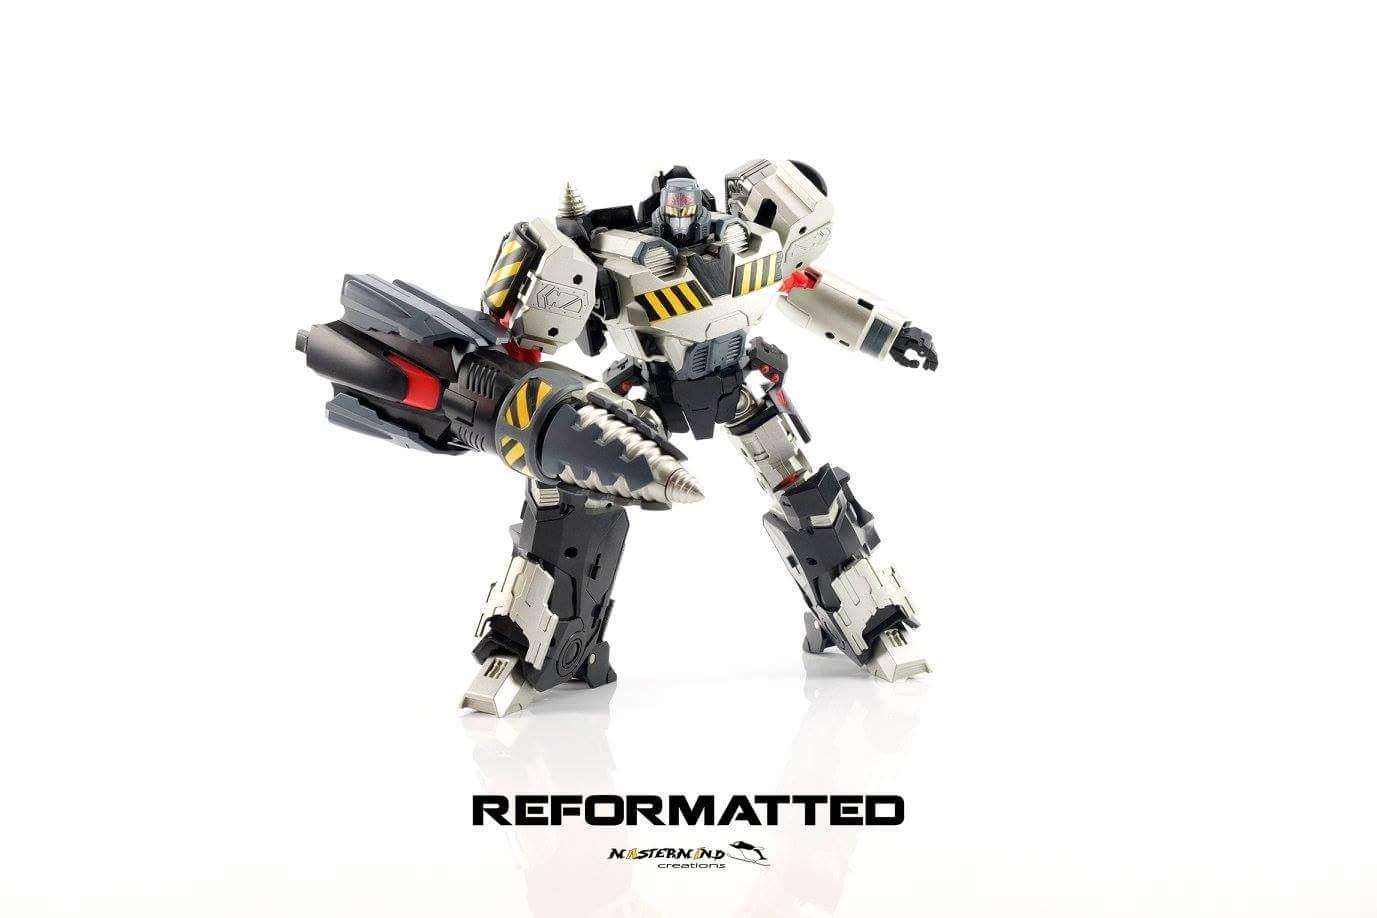 [Mastermind Creations] Produit Tiers - Reformatted R-28 Tyrantron - aka Megatron des BD IDW A2NX0JsT